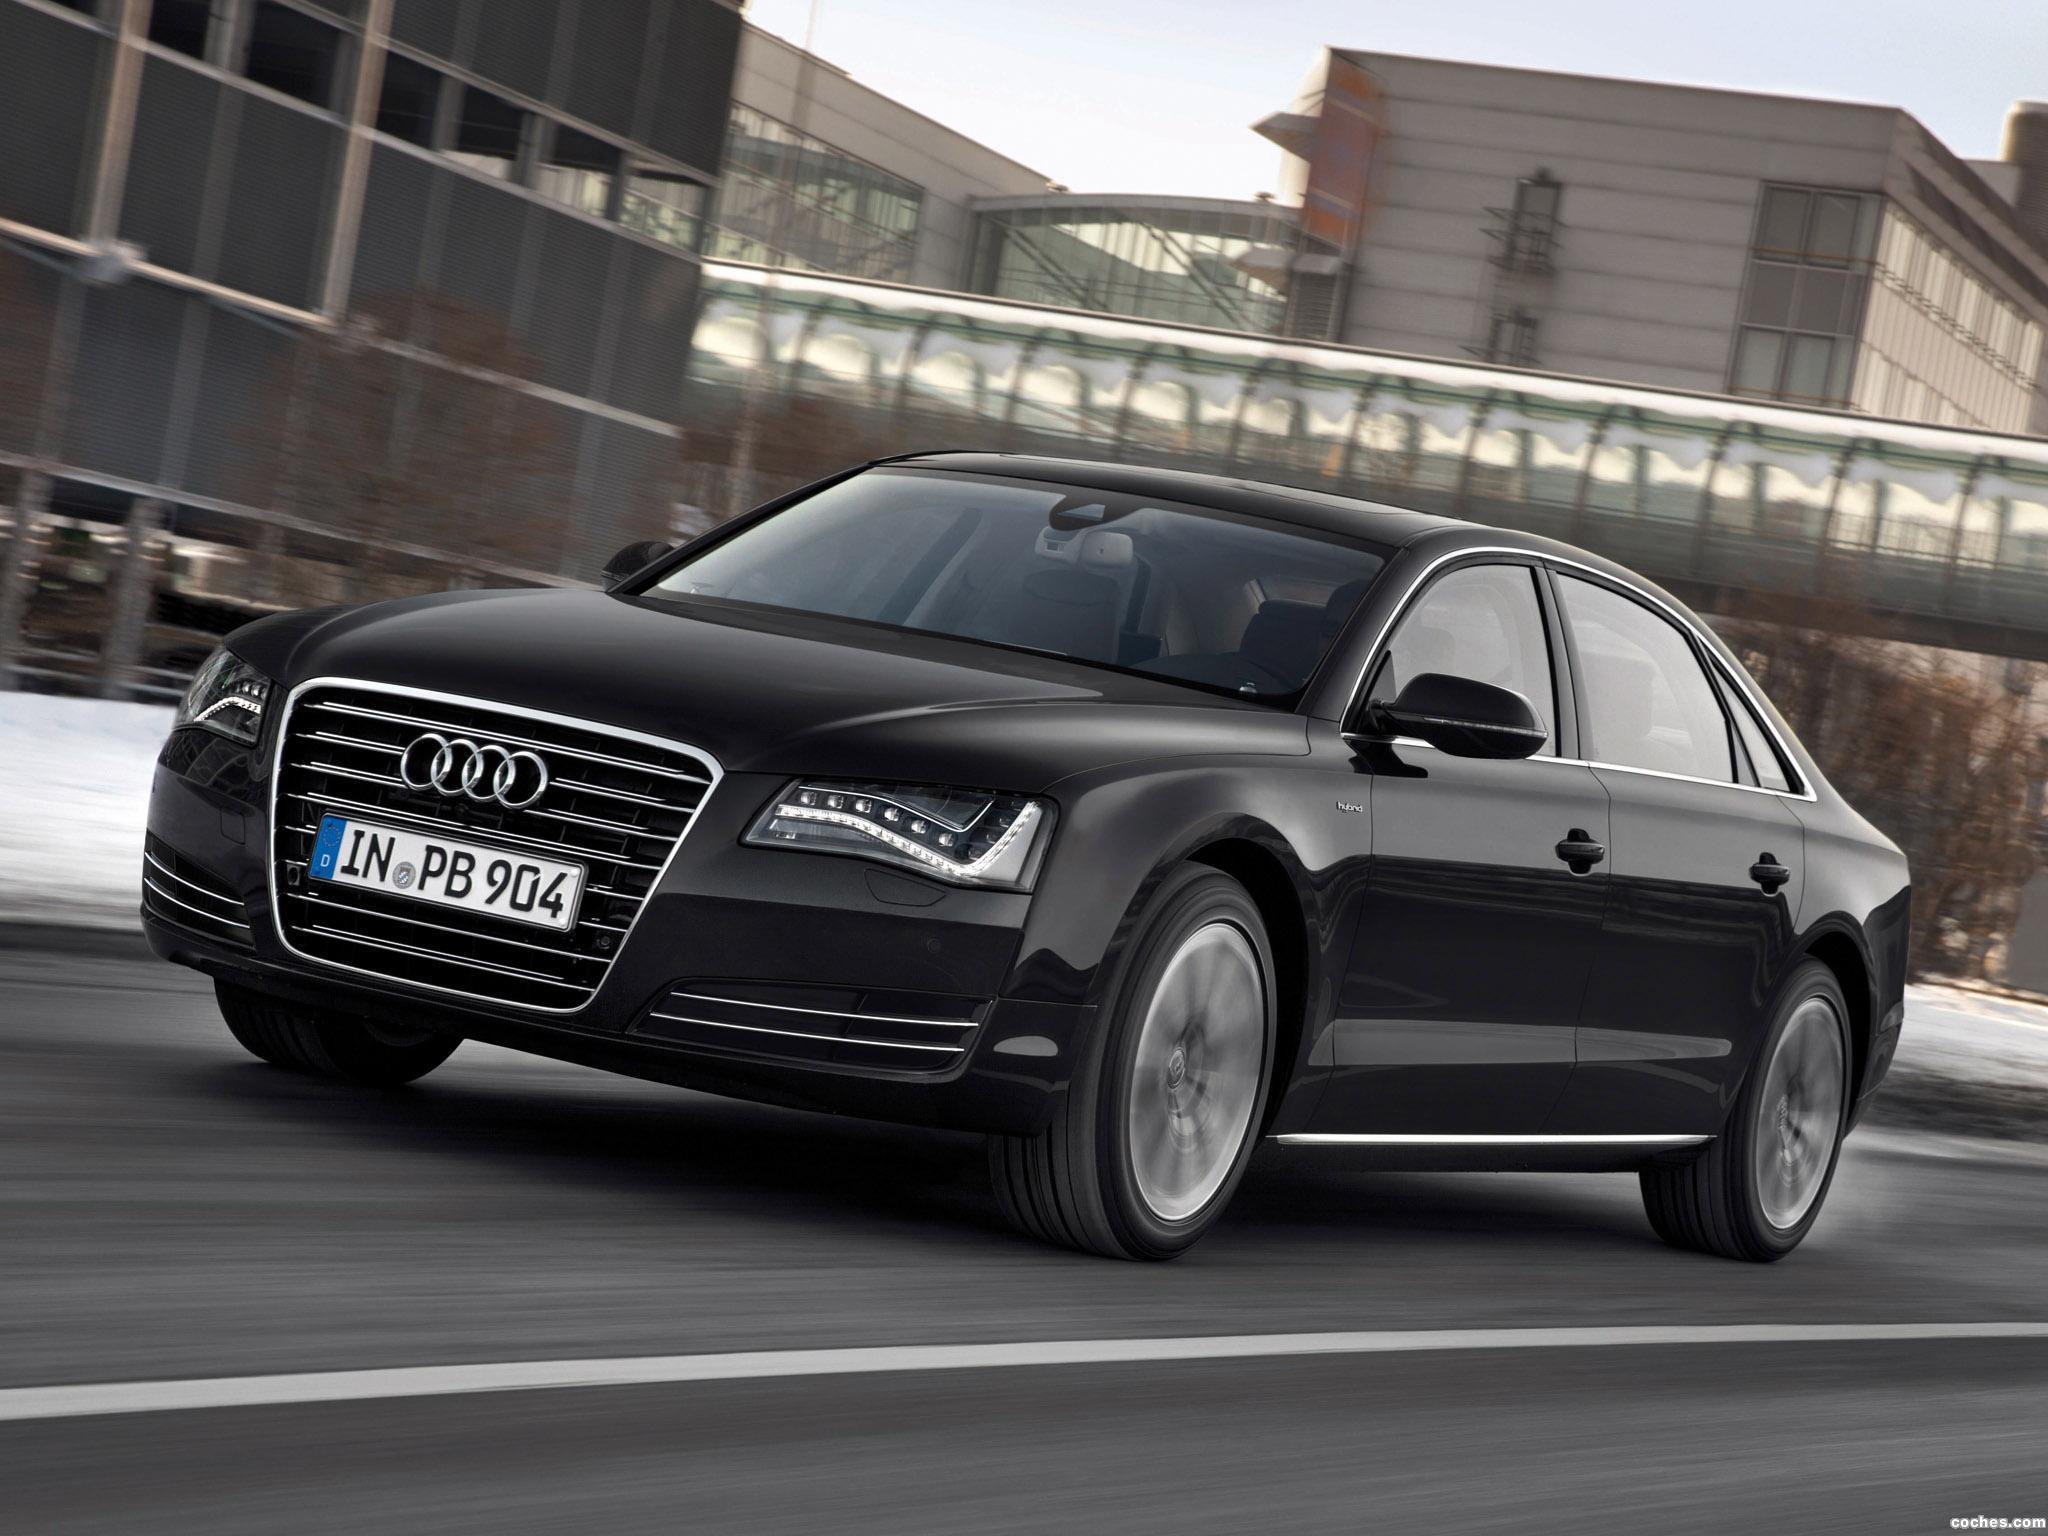 Foto 0 de Audi A8L Hybrid D4 2012